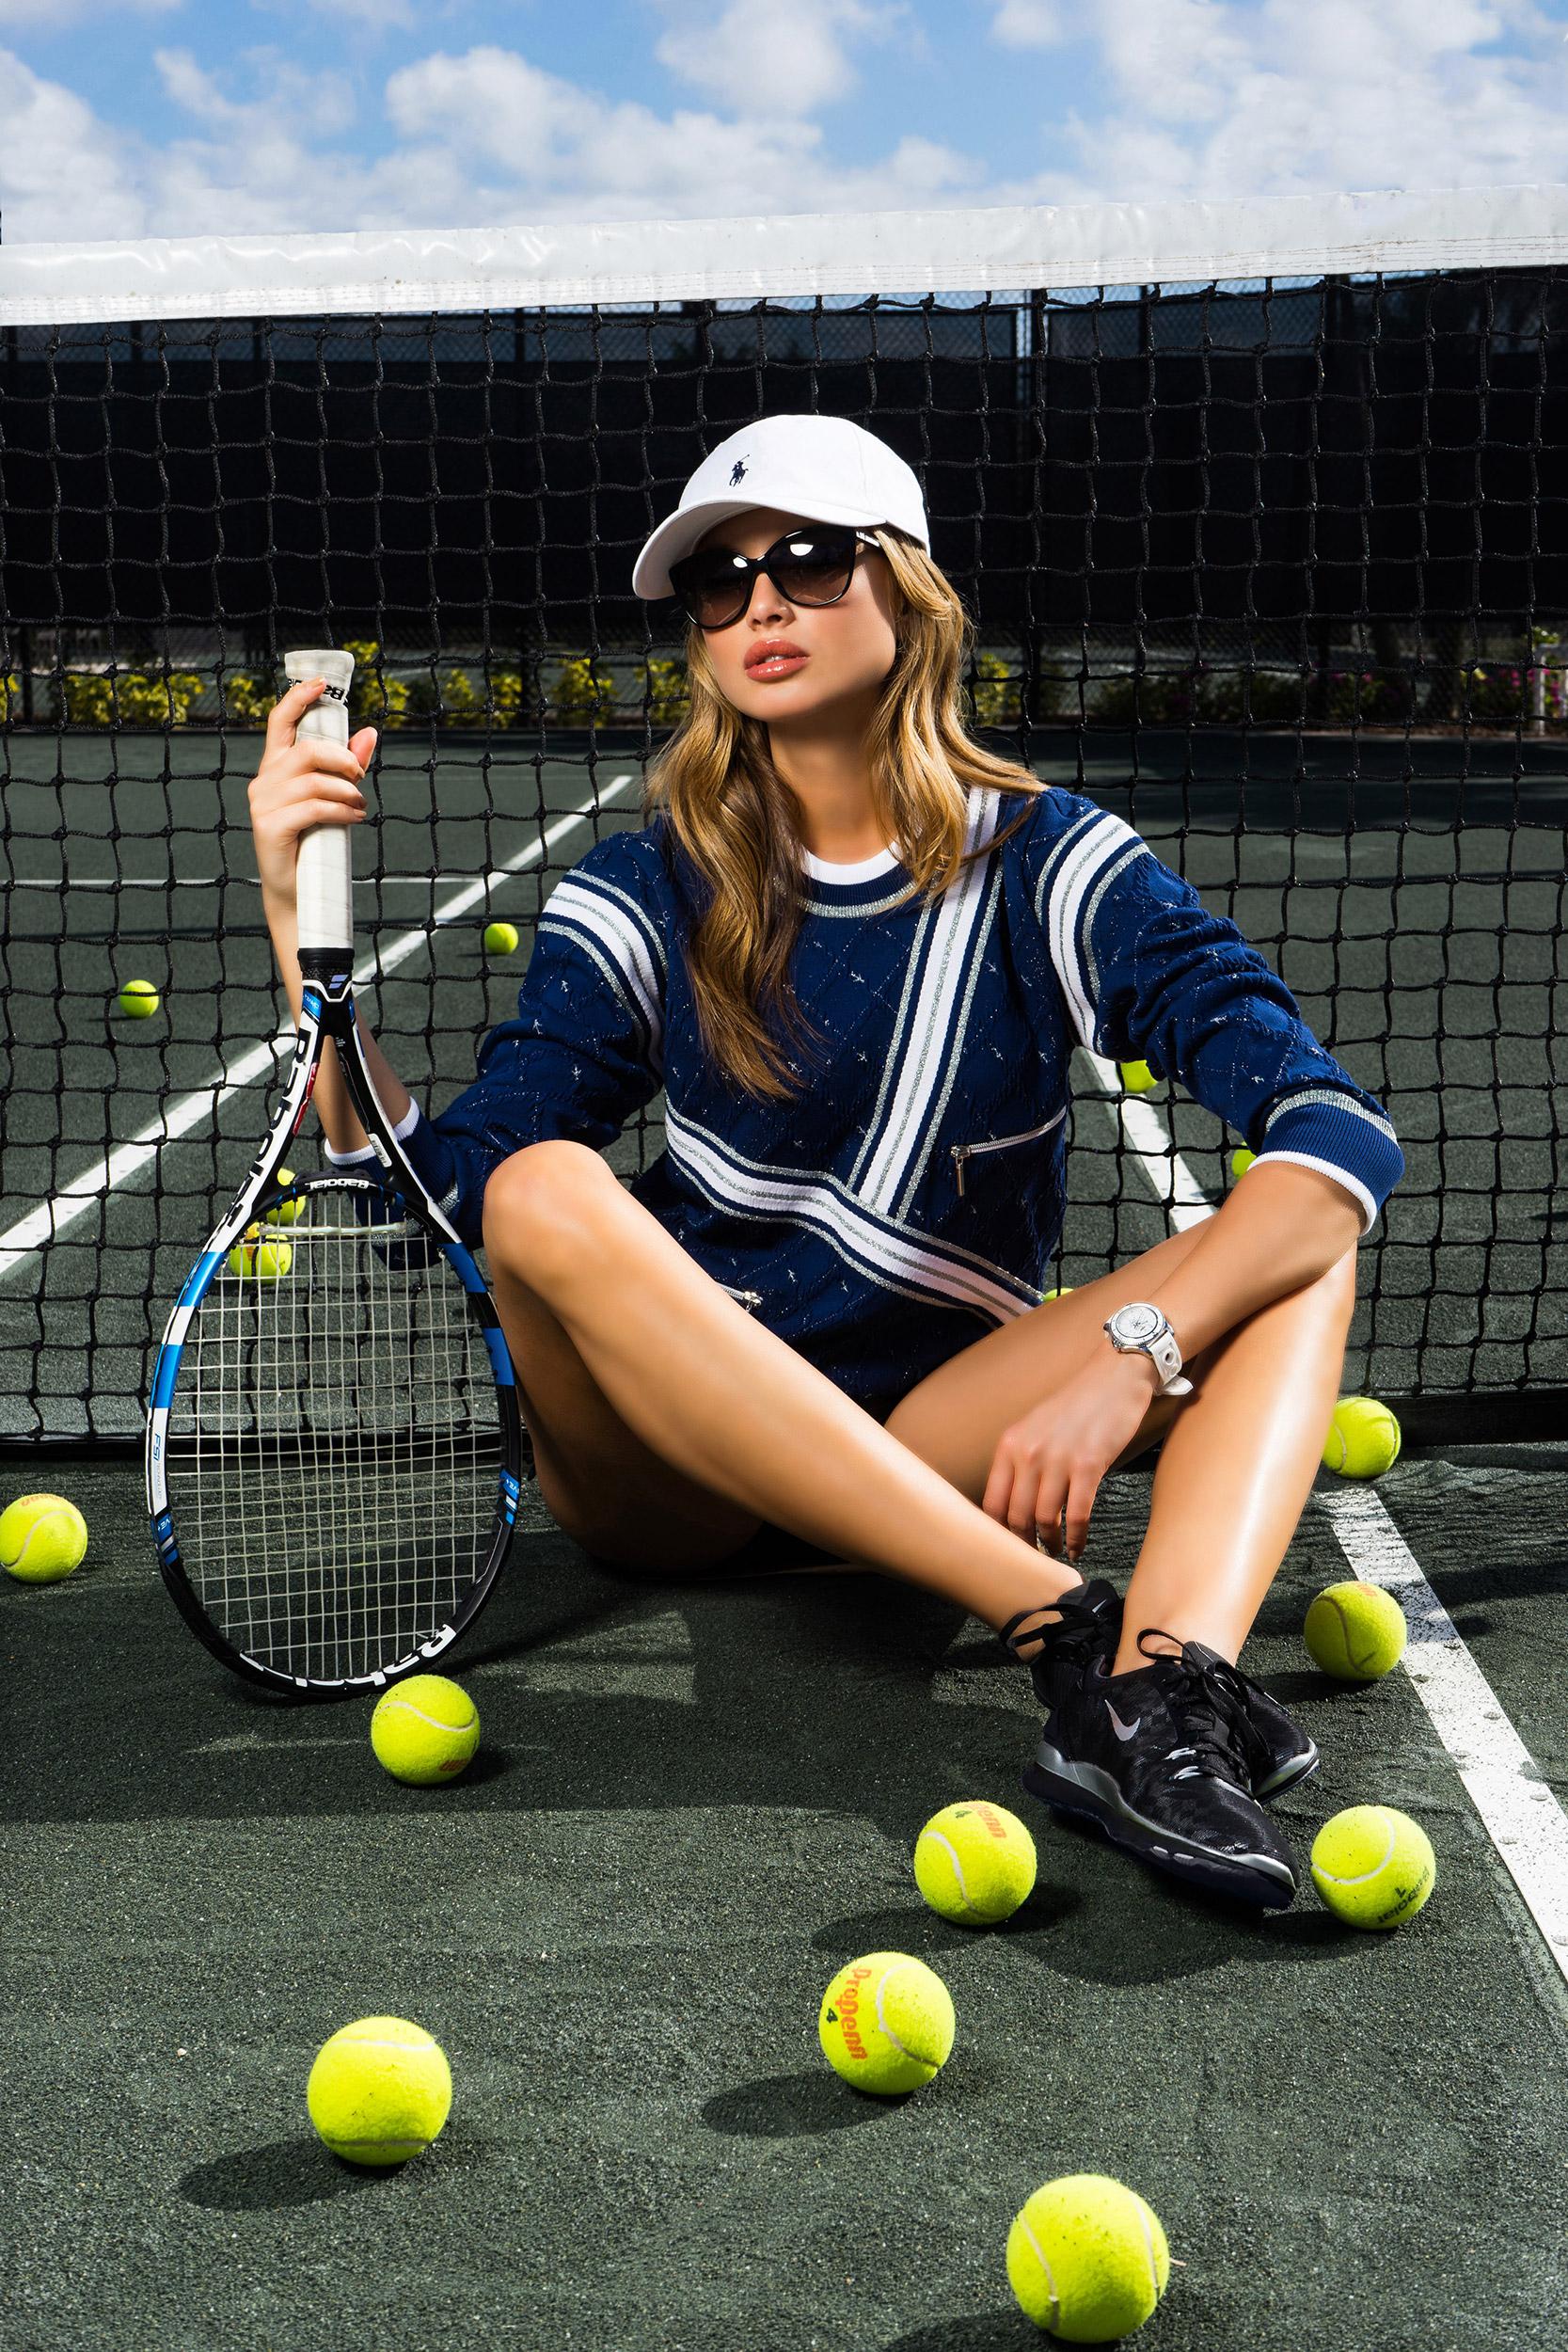 sports_fashion-5938.jpg